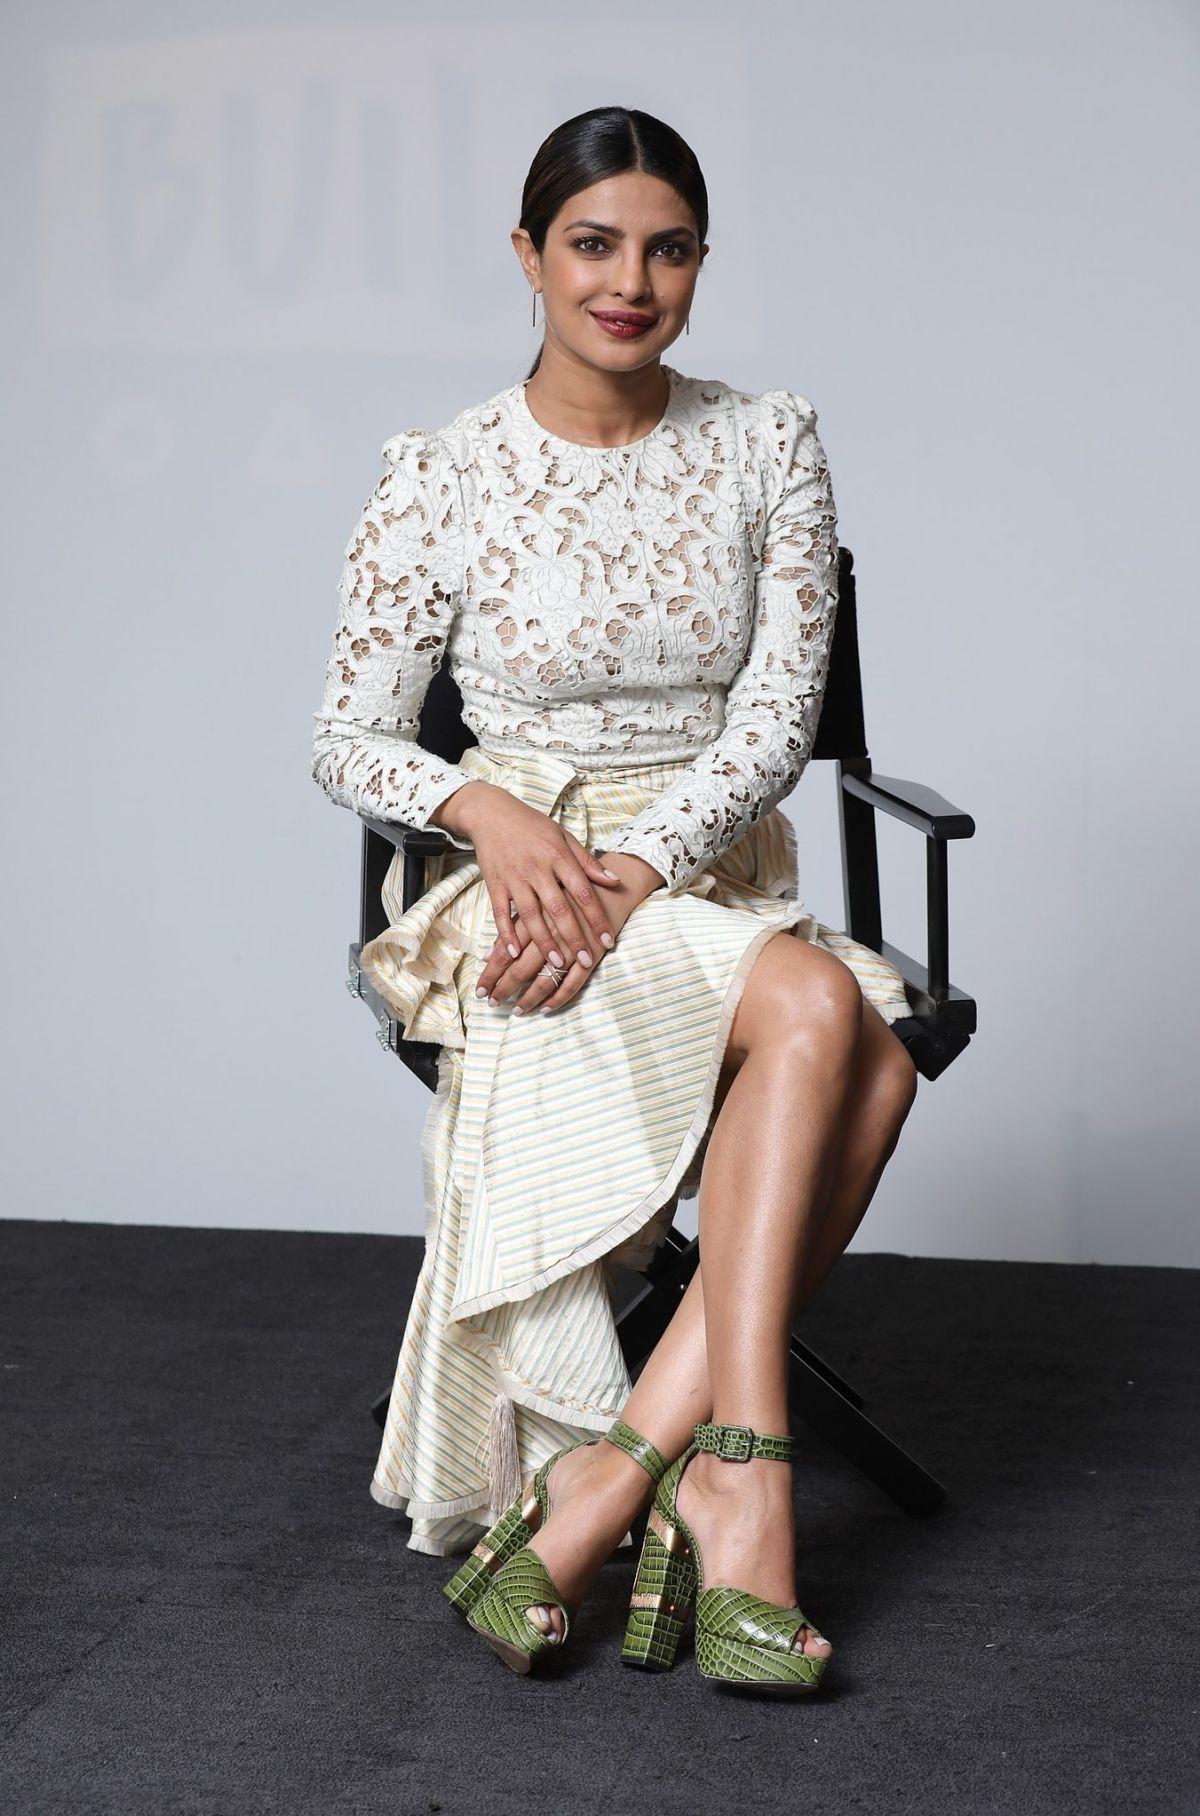 Fucked priyanka chopra by her legs — photo 12